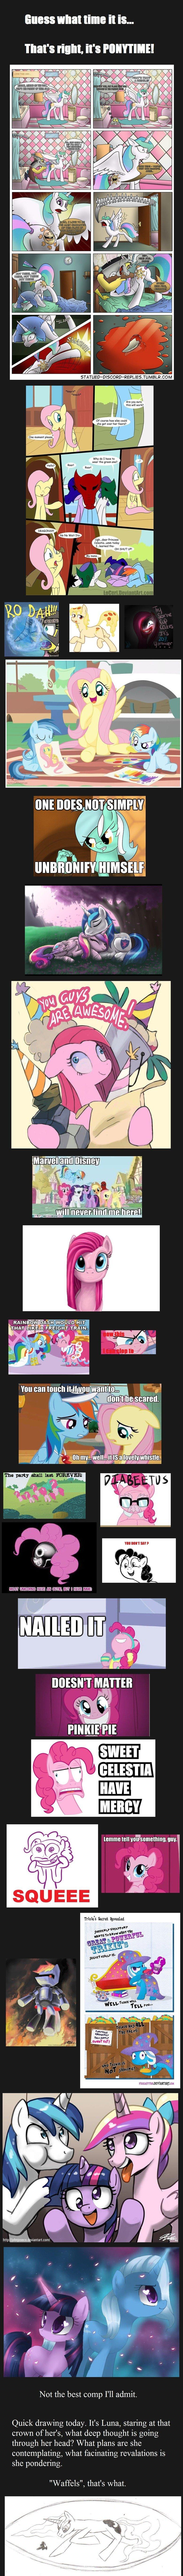 Ponycomp 141. Ponycomp 140: /channel/ponytime/Ponycomp+140/keoaGxr/ DOWNLOAD LINK: www.mediafire.com/?eeoxr0quxvkz0 My DeviantART: .. That's a lot of Pinkie Pie posts! My Little Pony ponies ponytime